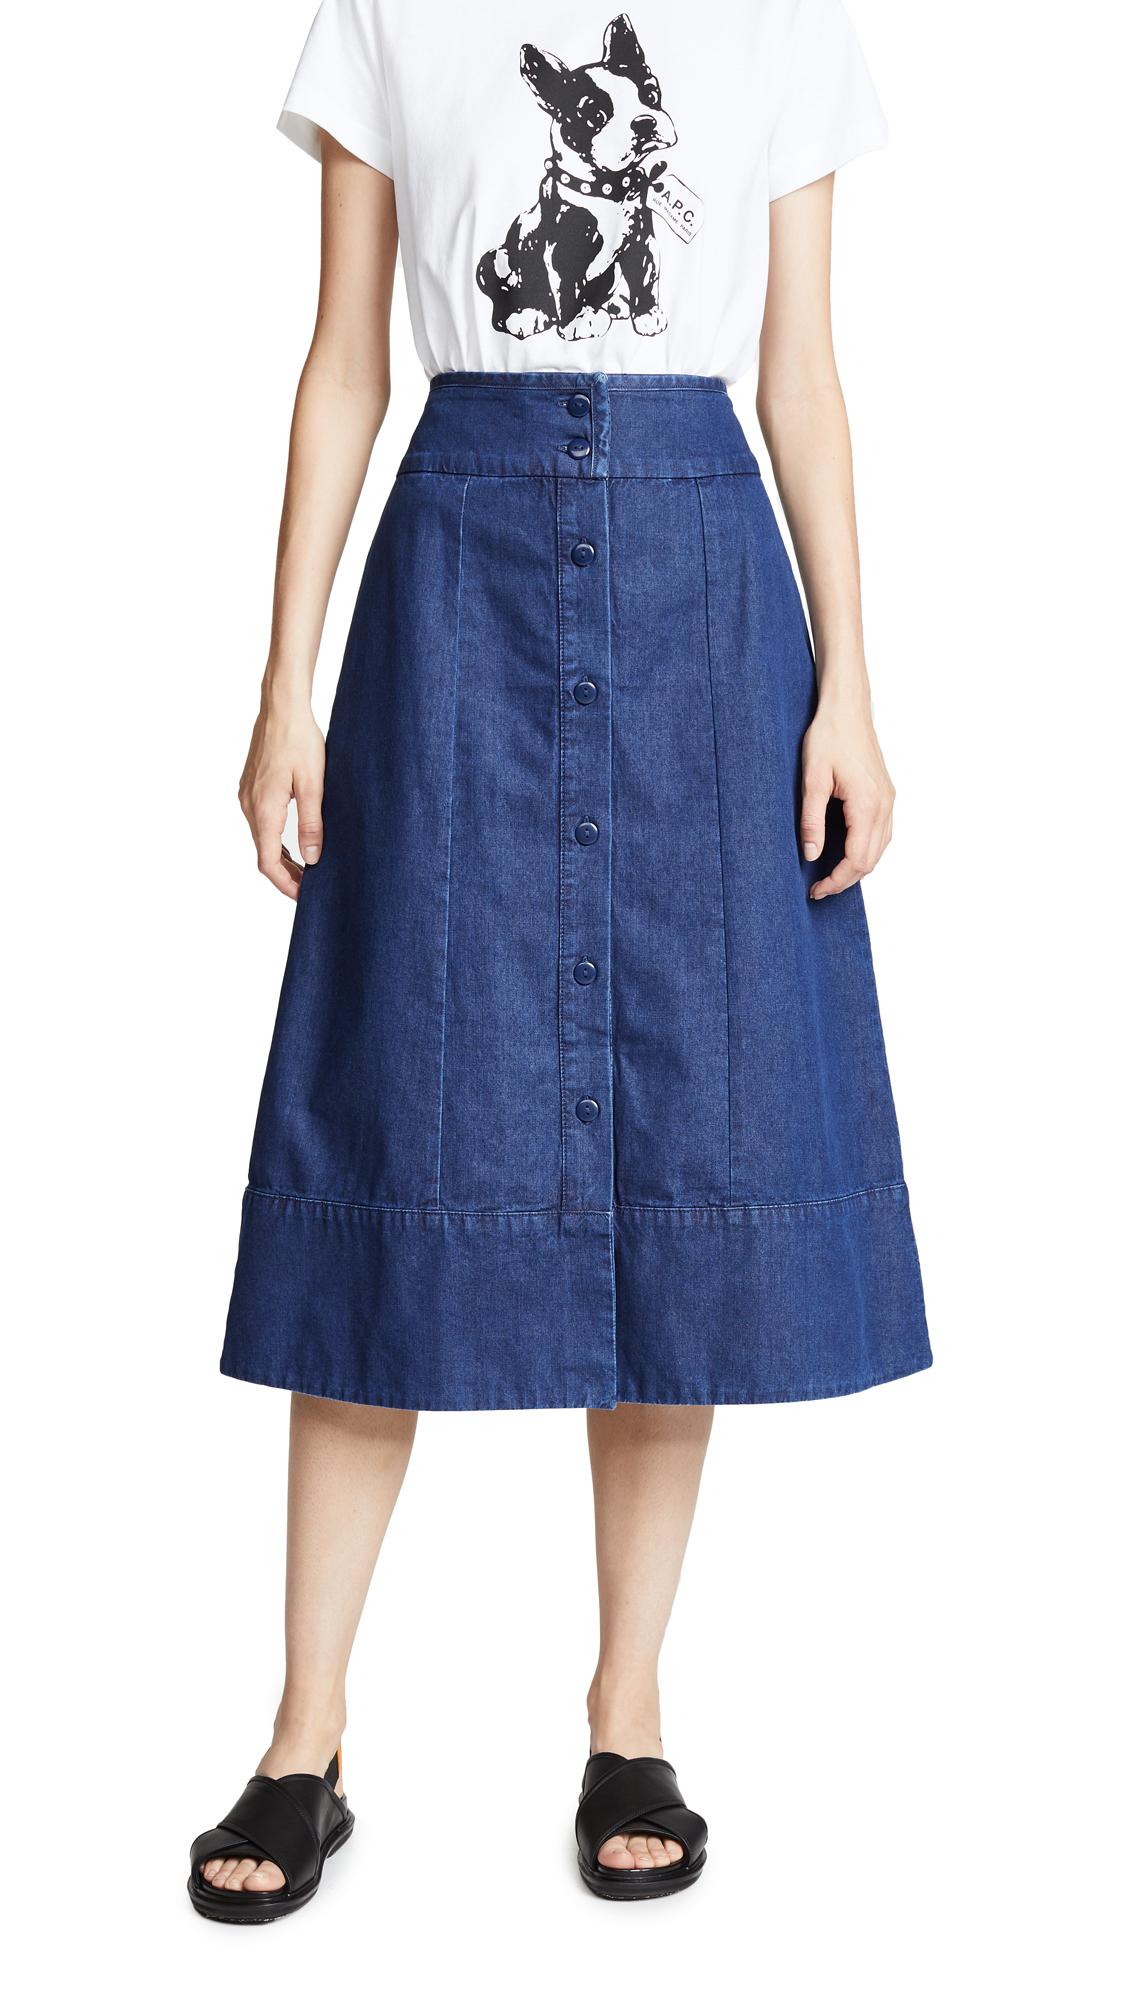 A.P.C. Knight Skirt In Indigo